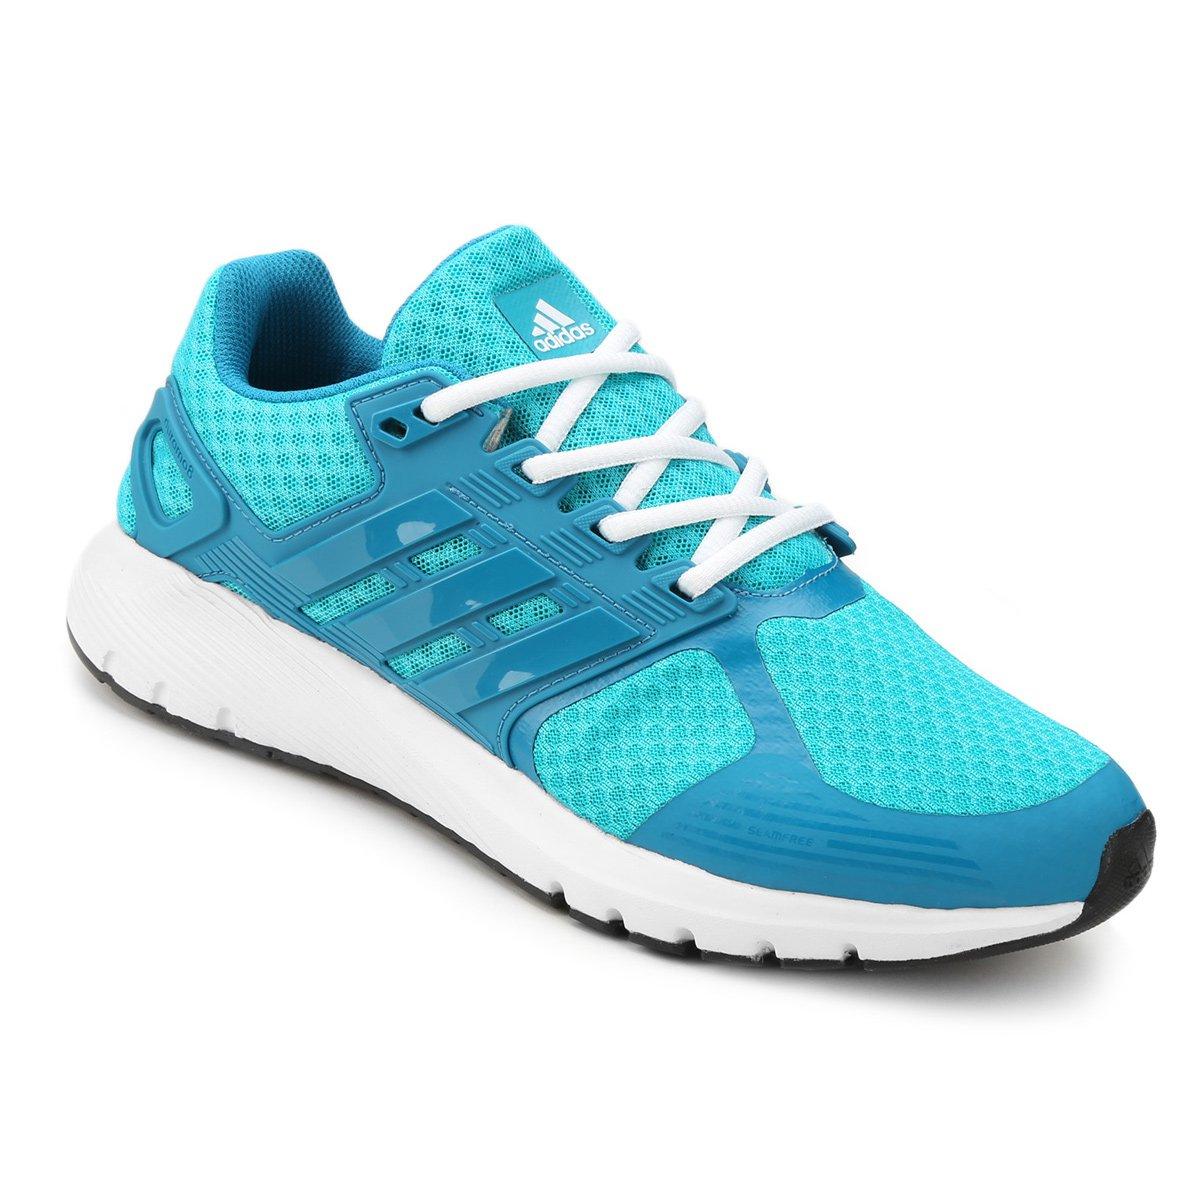 Tênis Adidas Duramo 8 Feminino - Azul Piscina e Azul Claro - Compre ... 9ef4fdcffda68